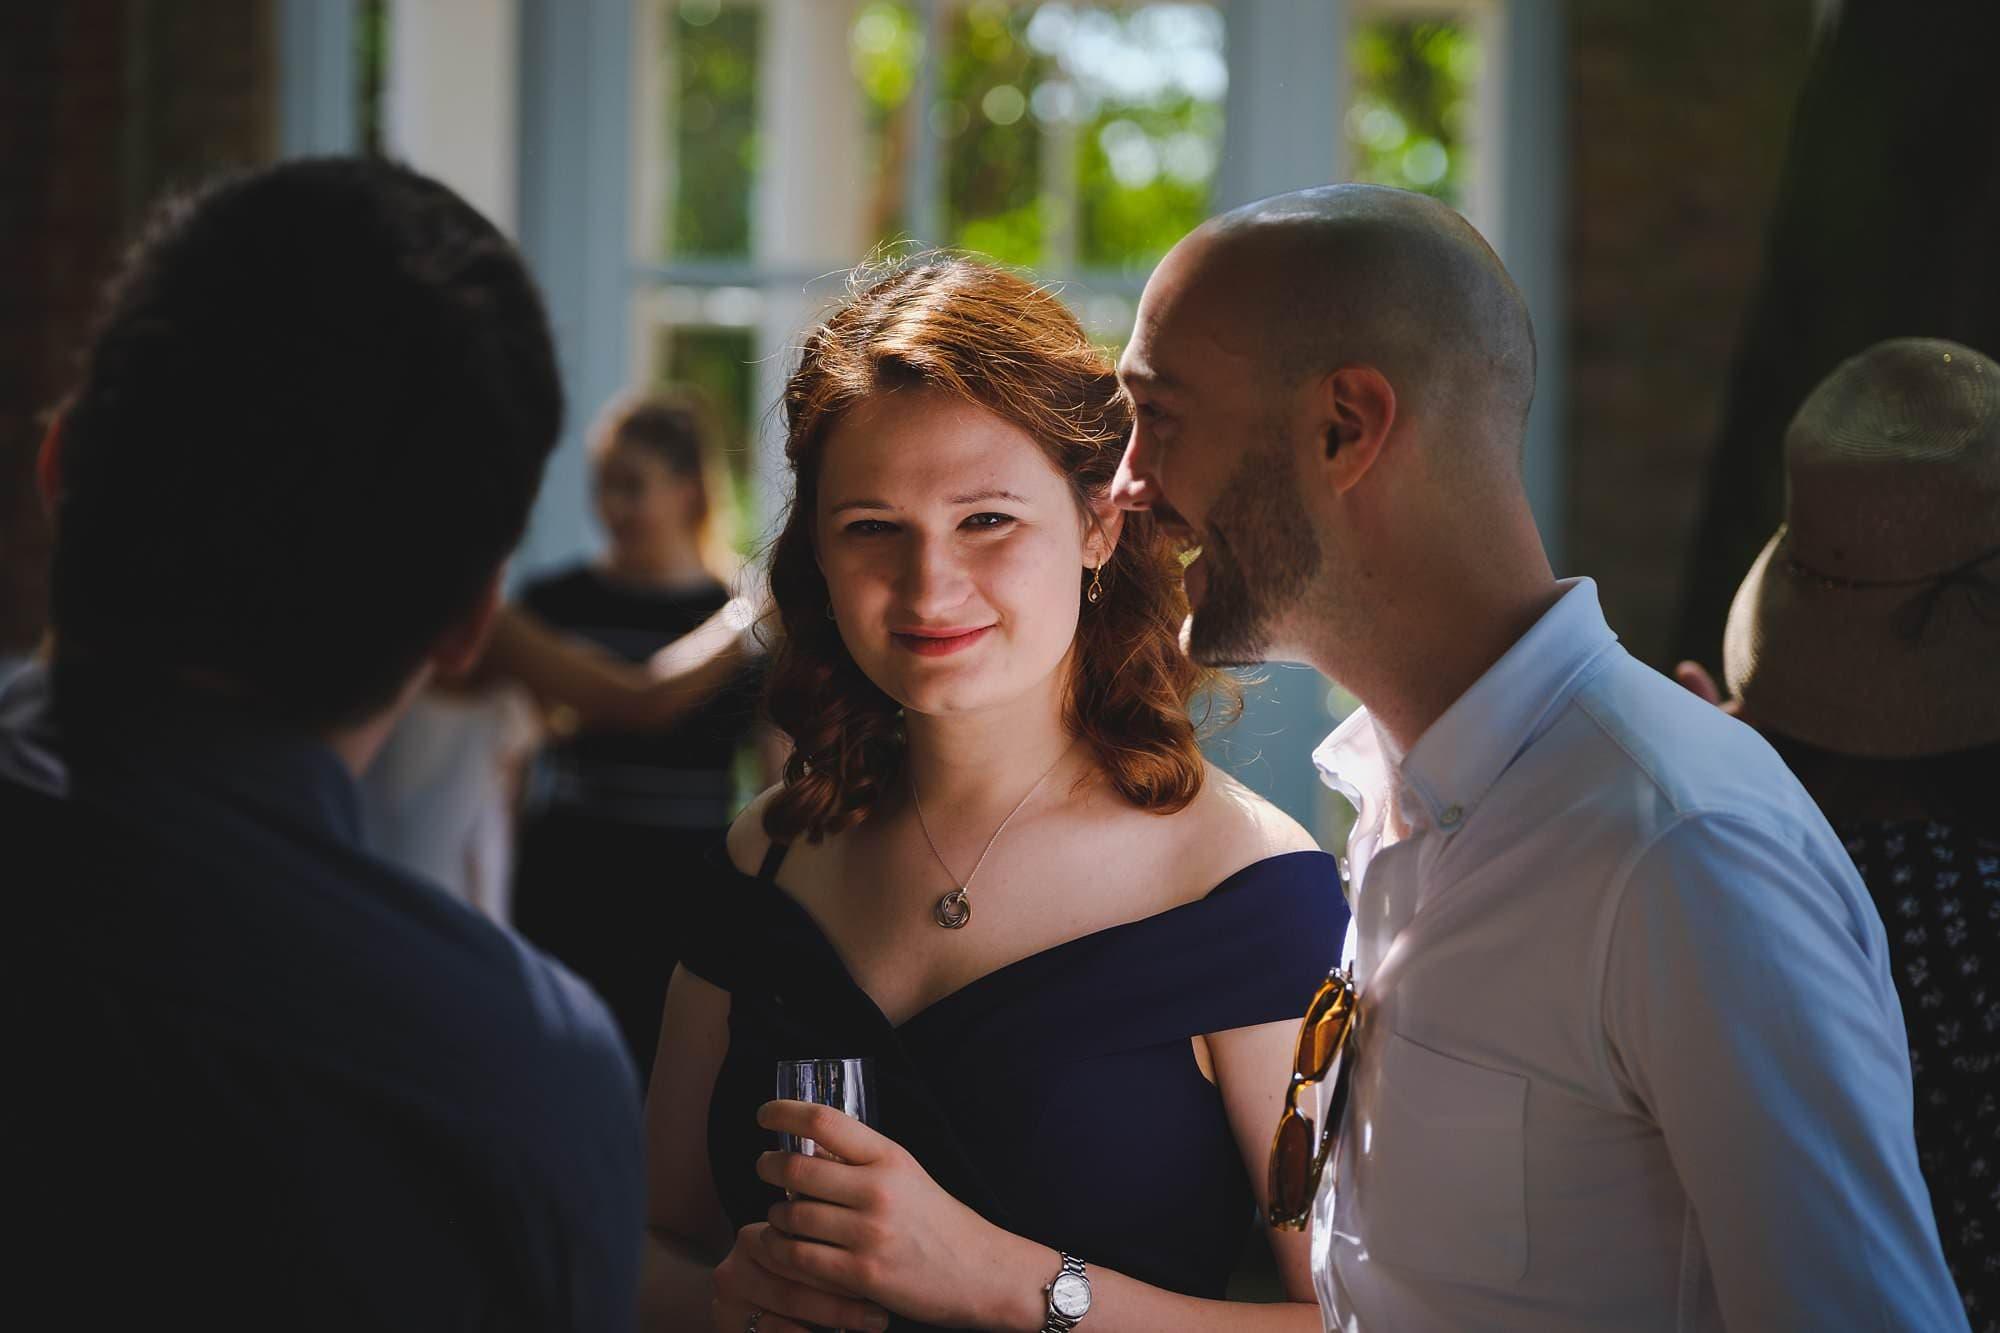 orangery holland park wedding reception 006 - Holland Park Orangery Wedding Photographer | Ayesha & Ritam